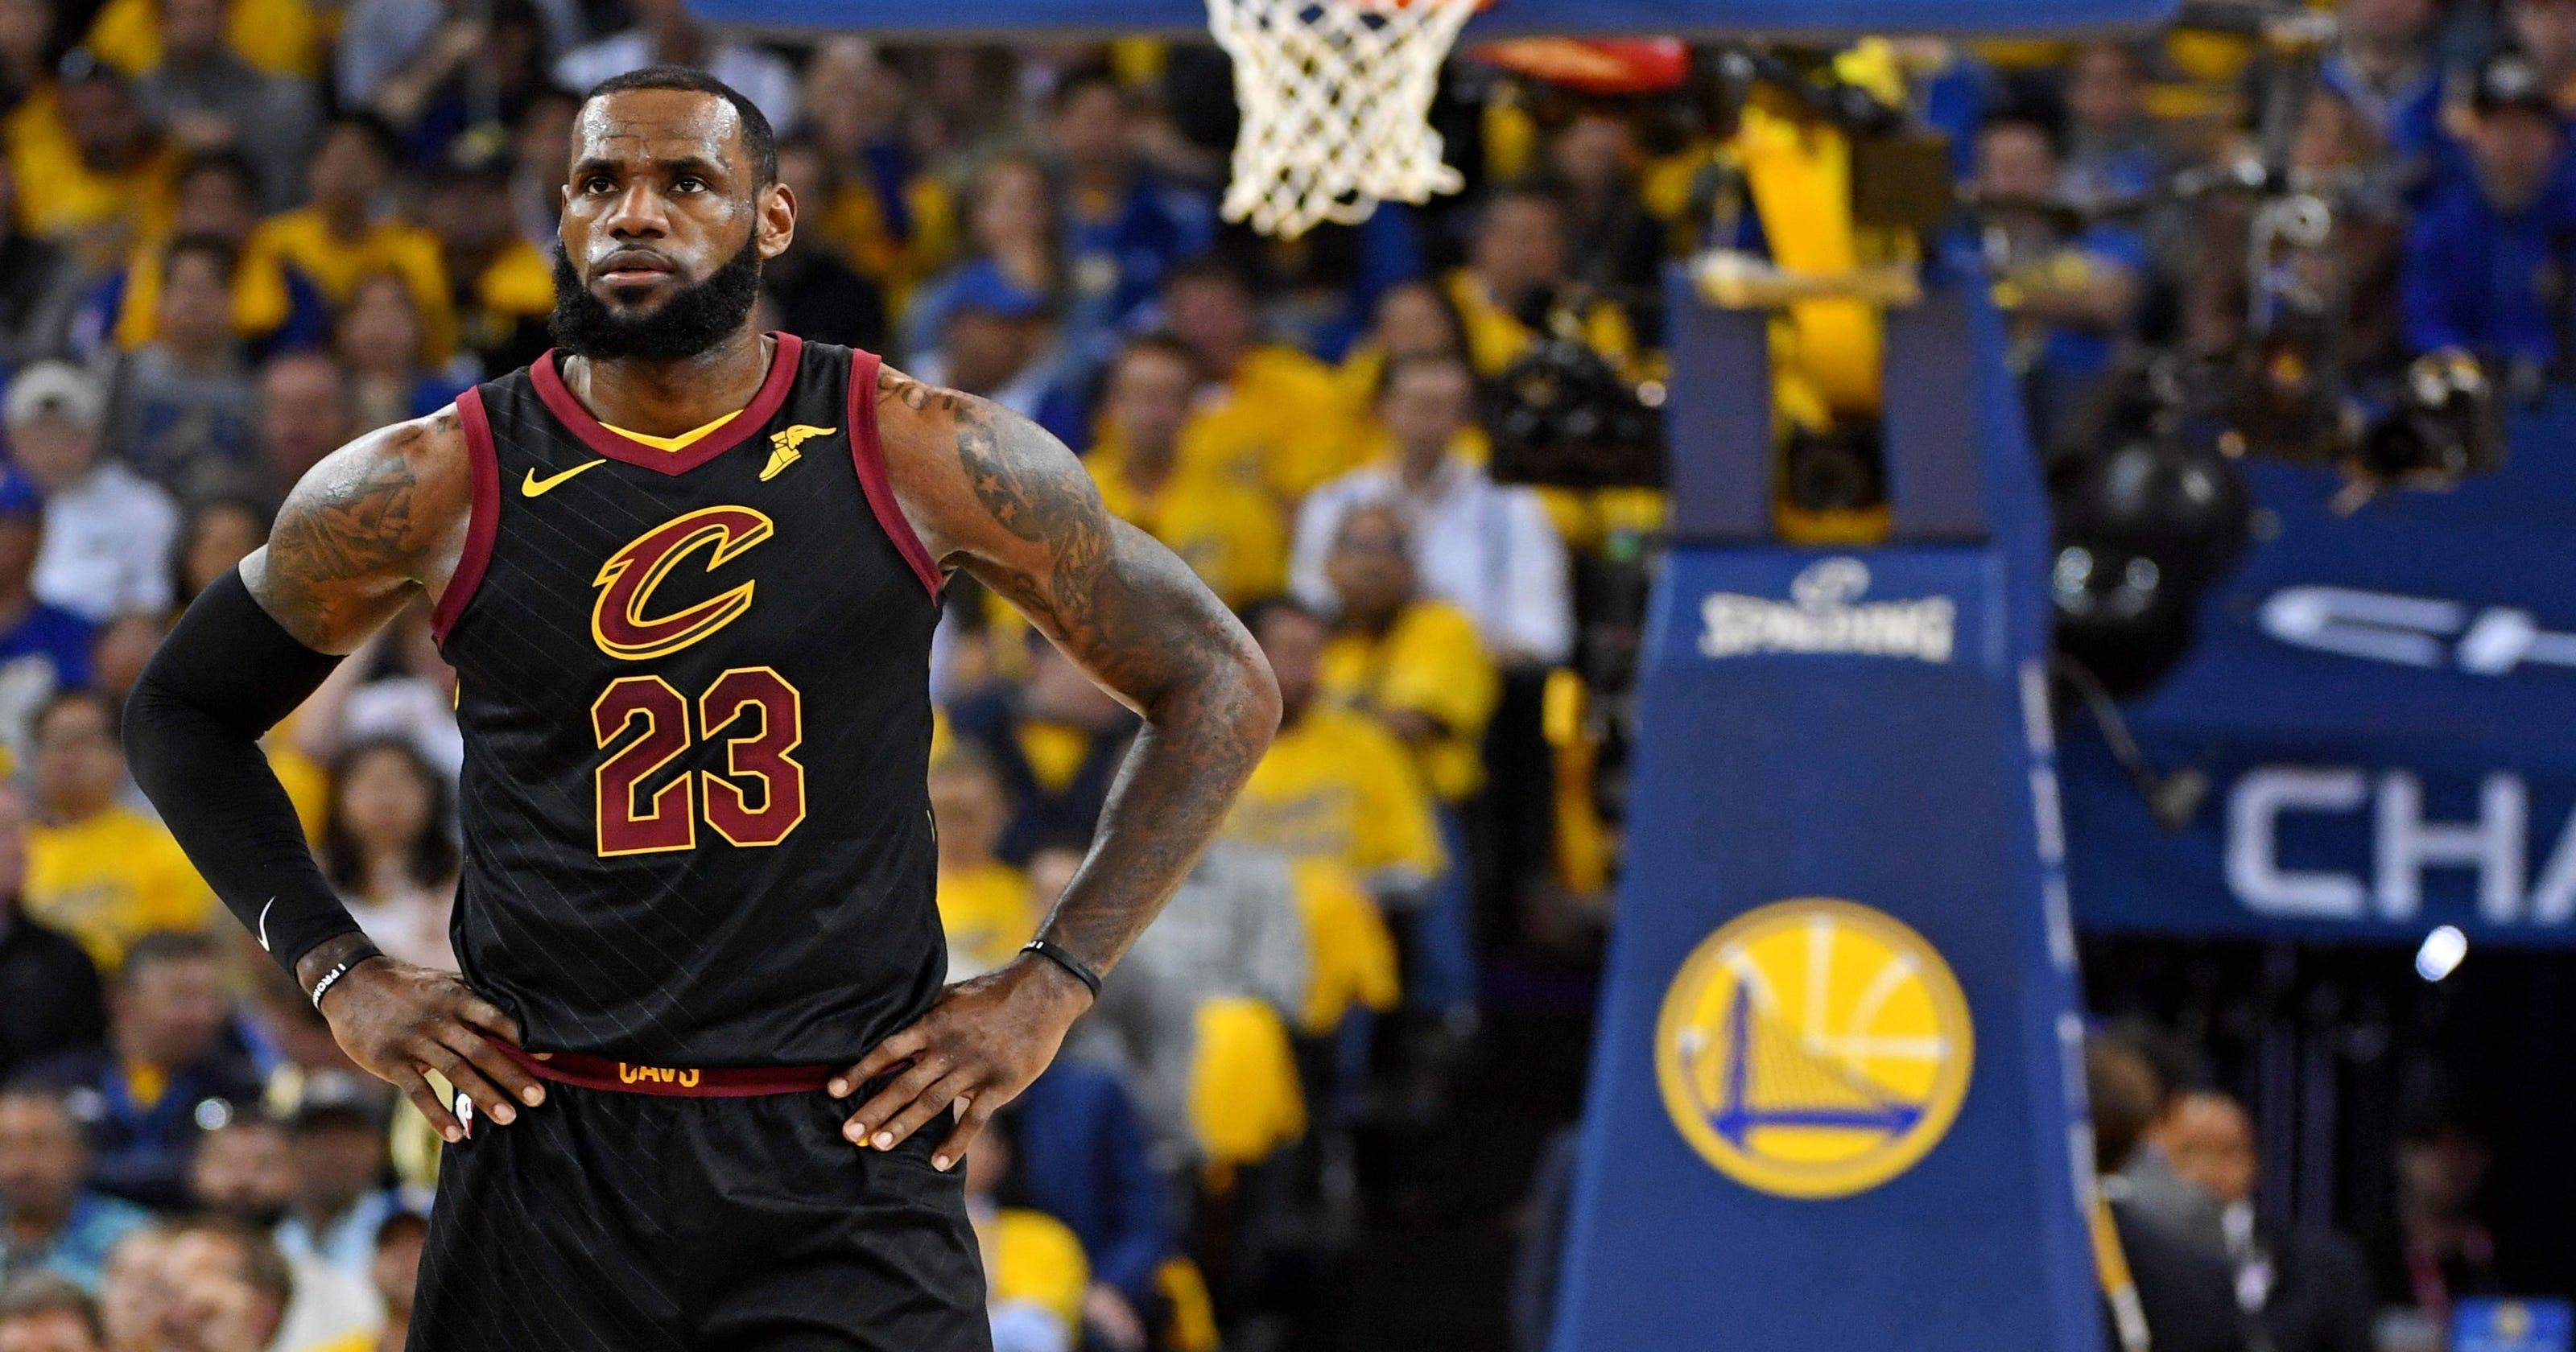 Kobe praises LeBron's teammates: 'He has some good talent'